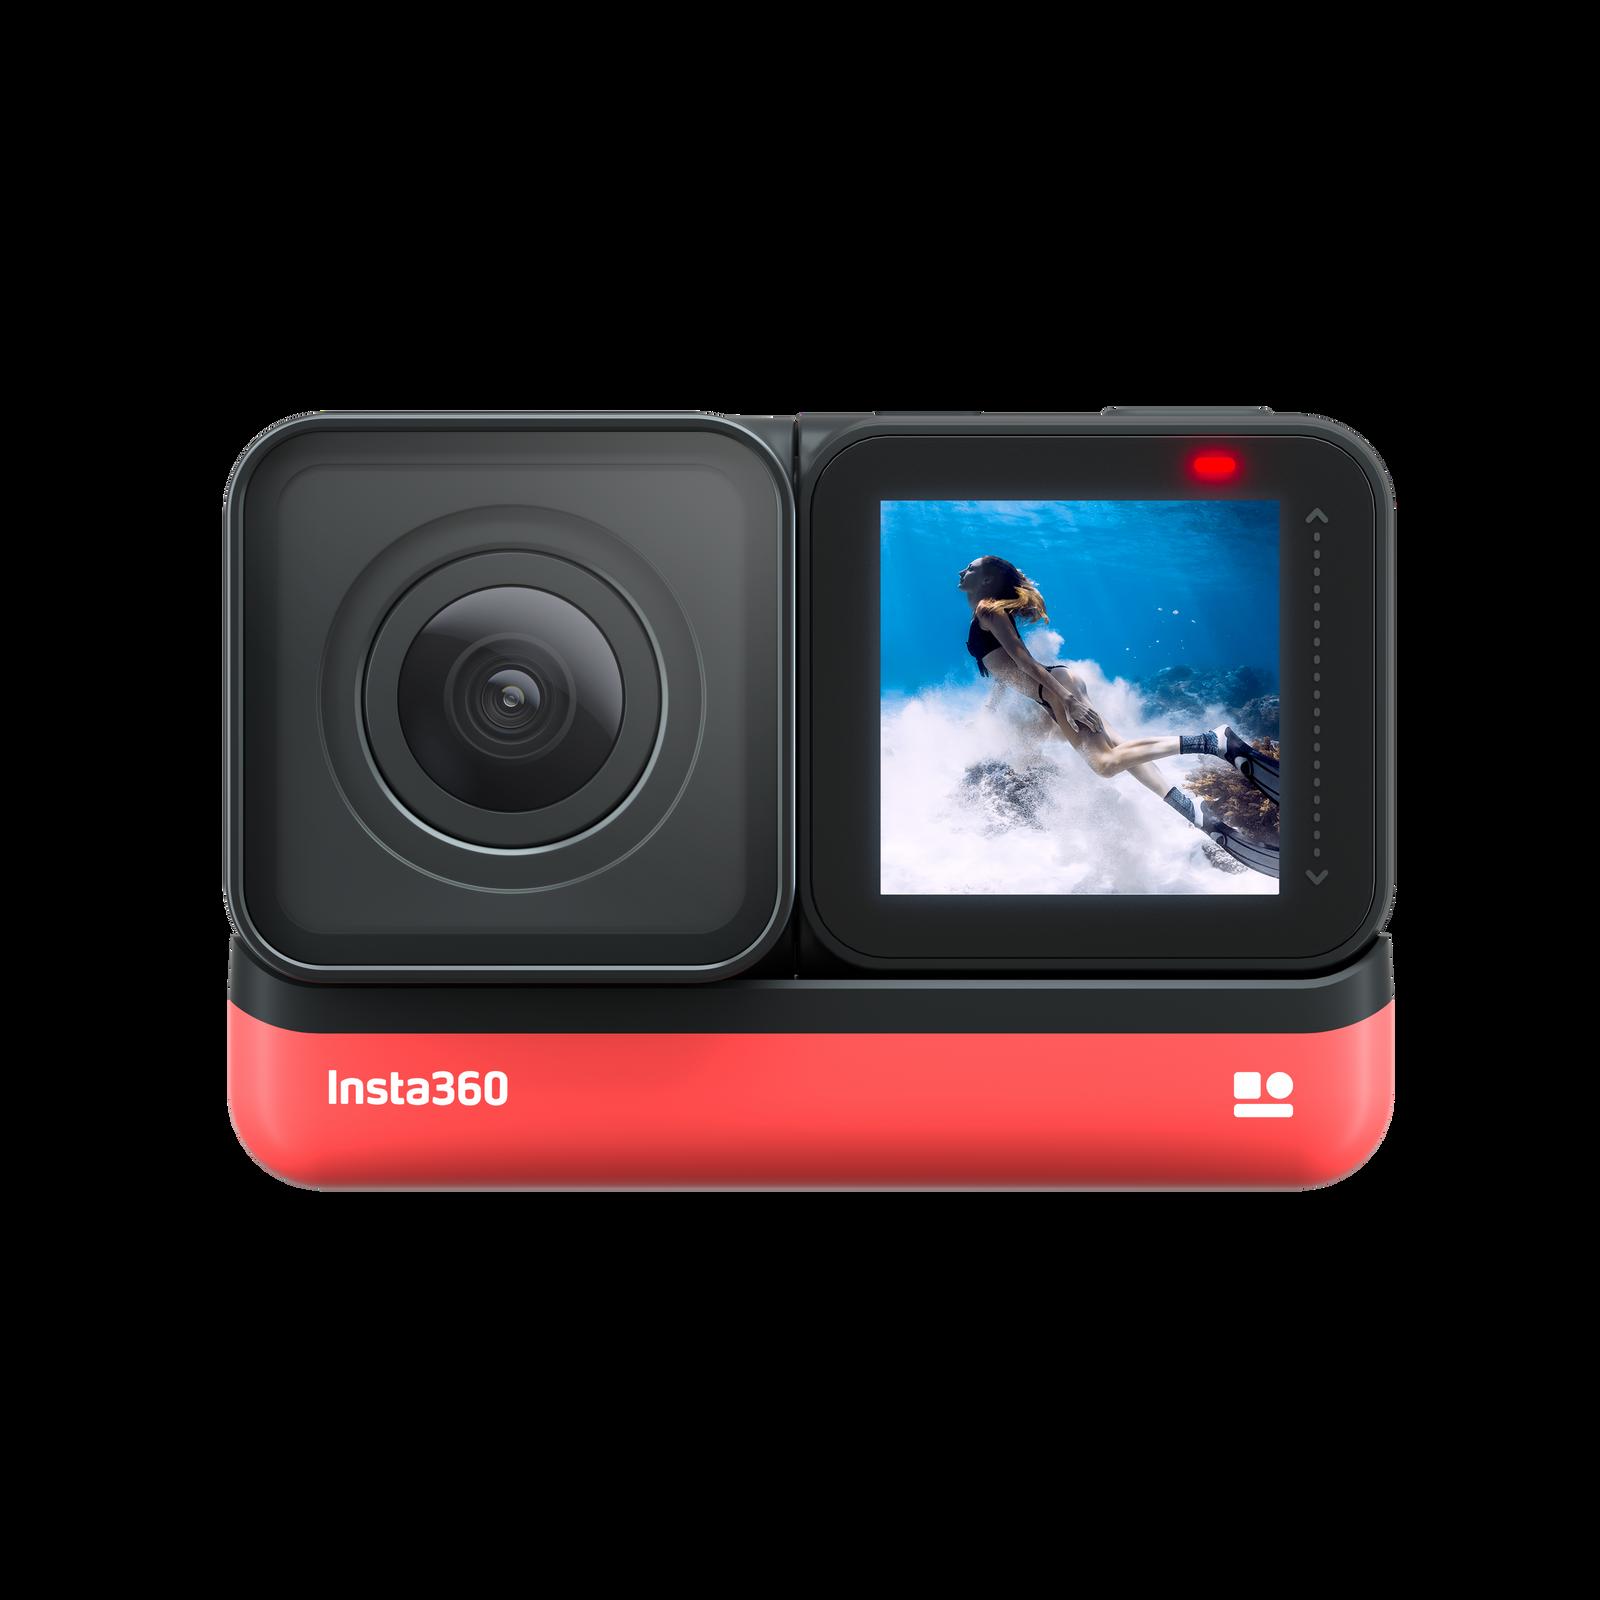 Insta360-ONE R - 4K camera mounted in selfie mode